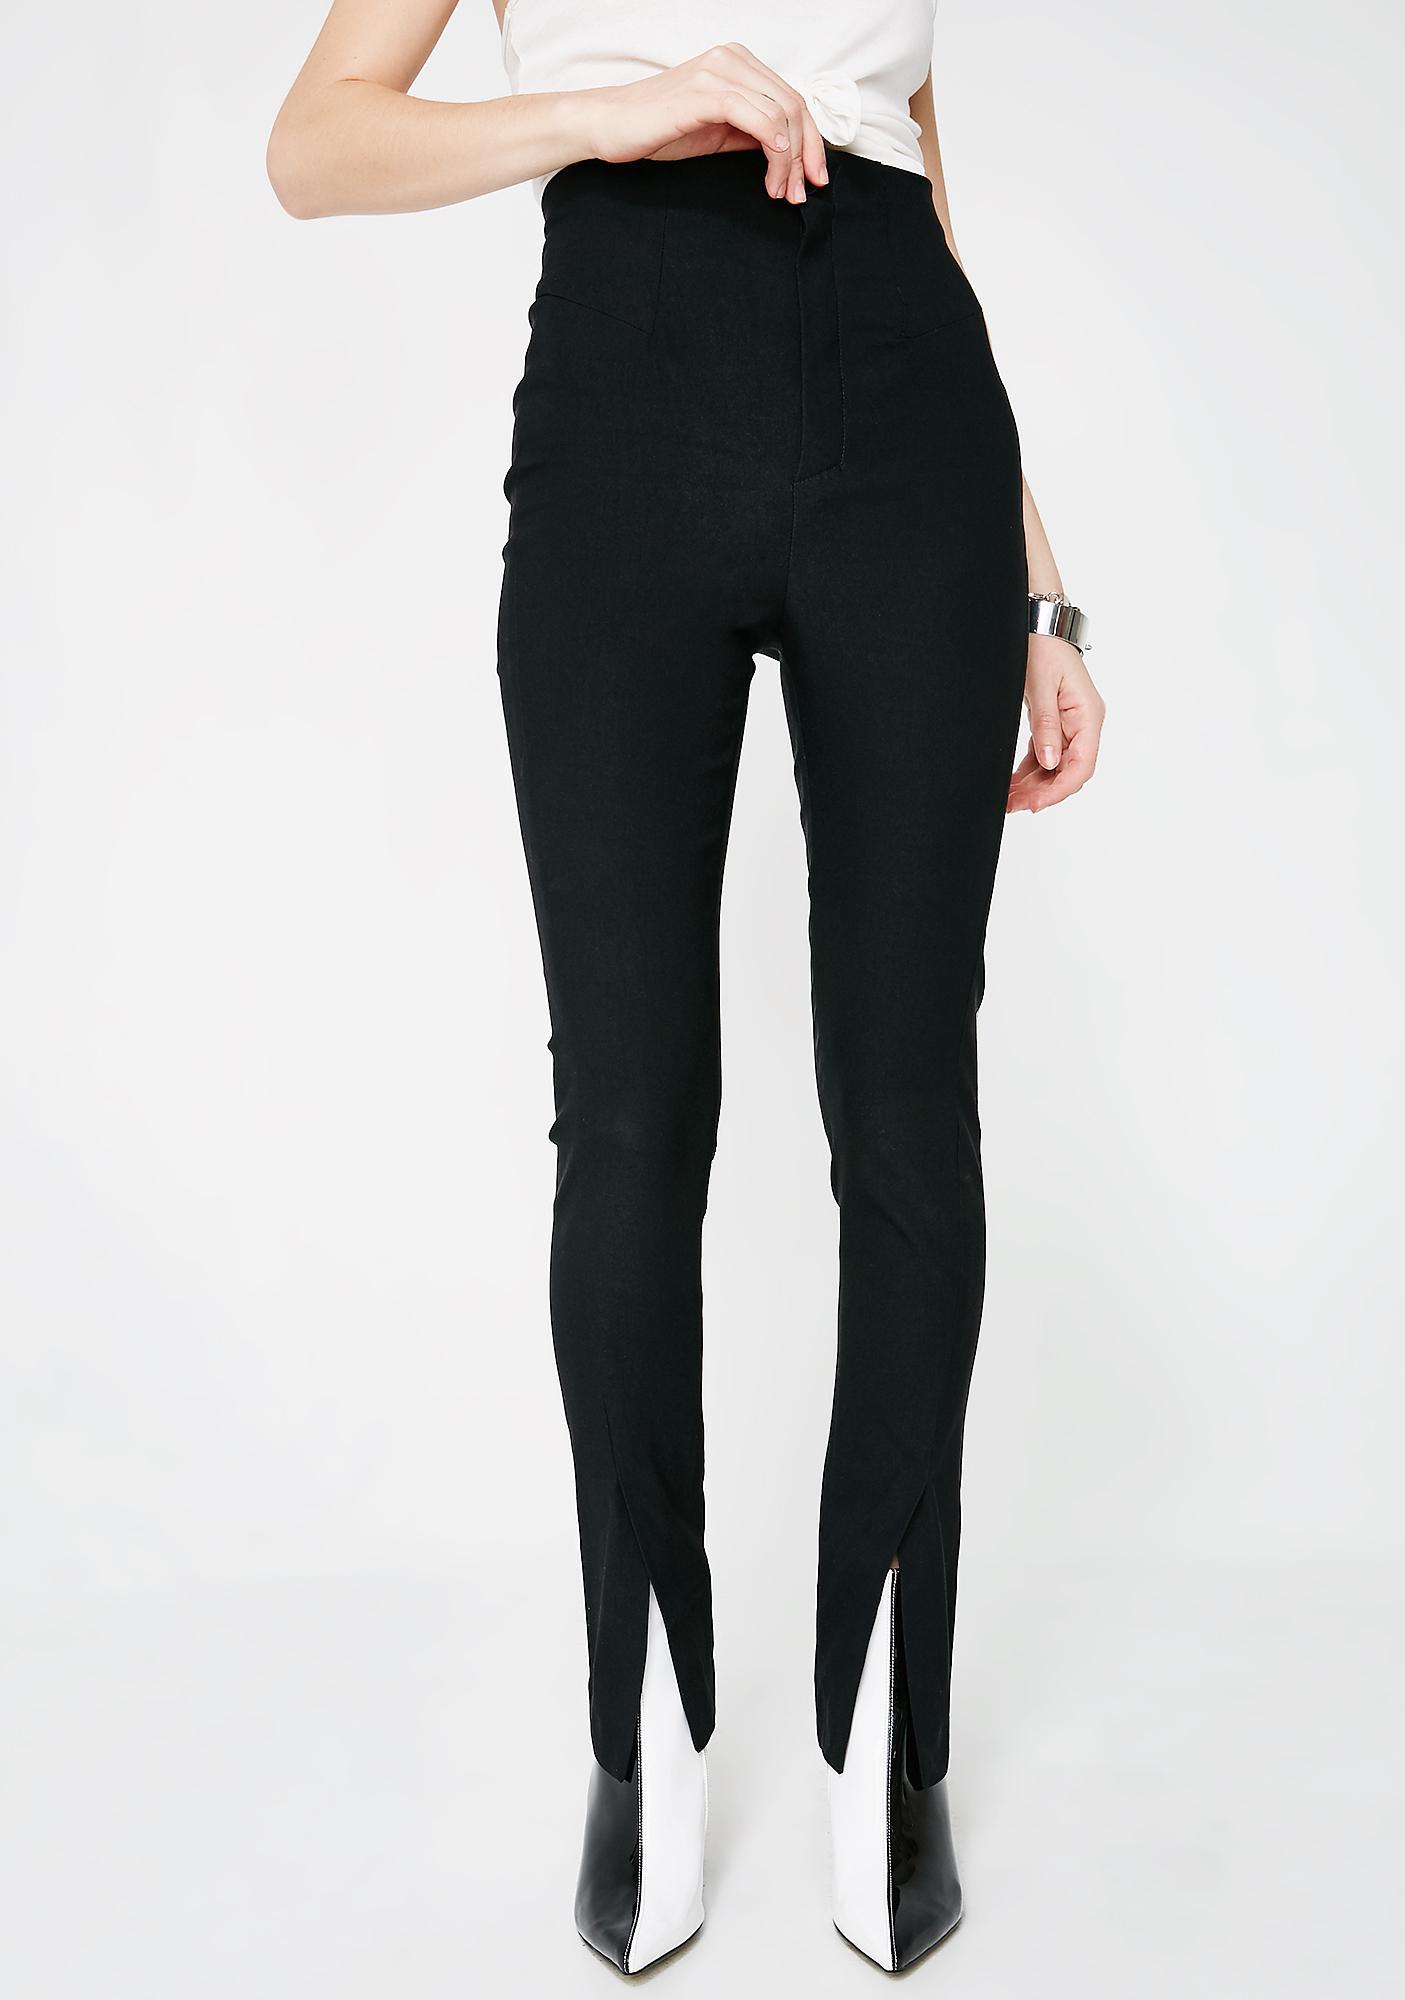 Slay Mode High Waist Pants